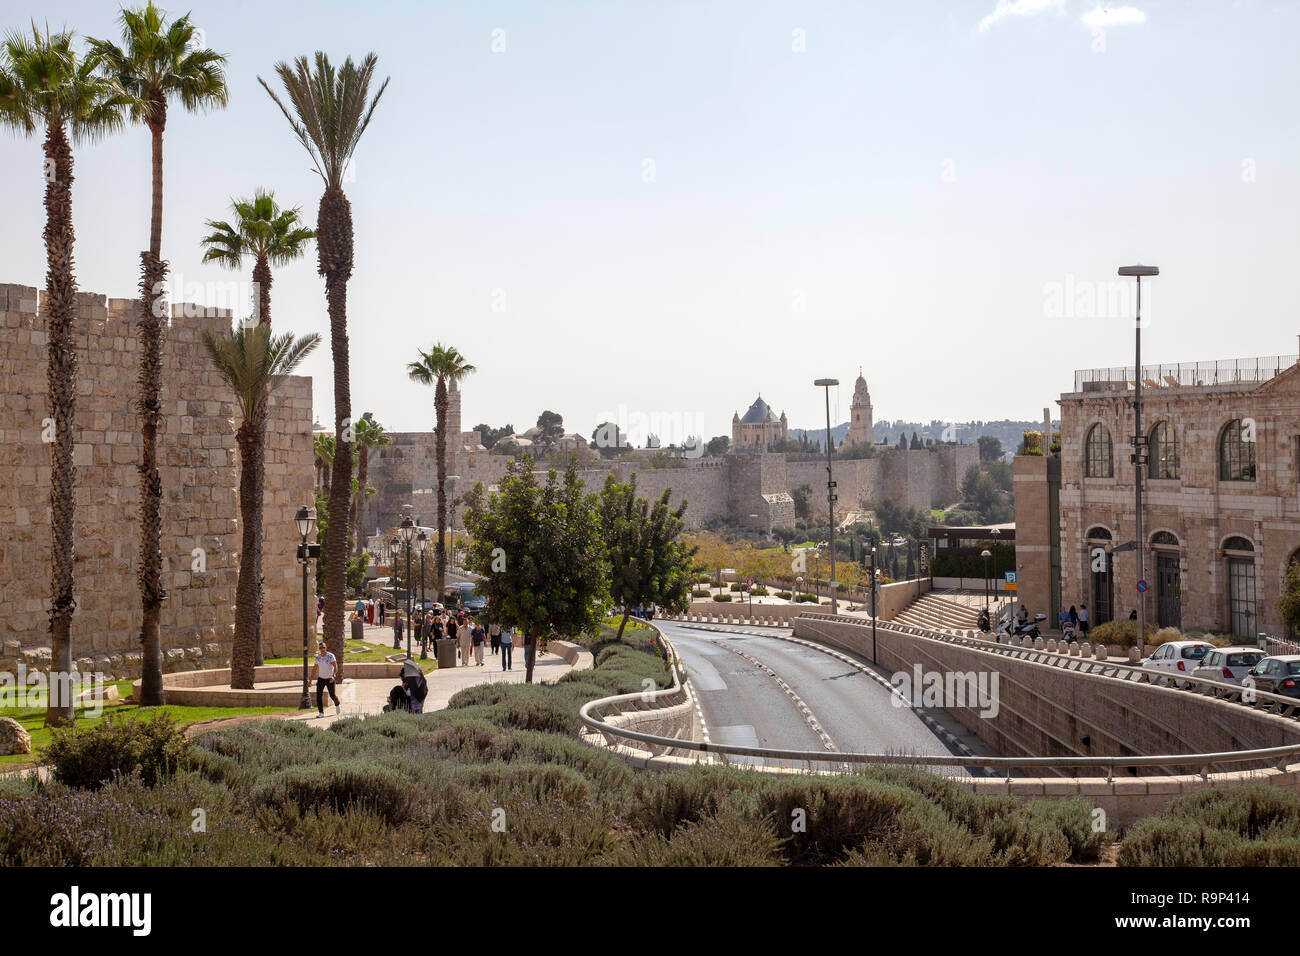 Jaffa Street Underpass Along Jerusalem Old City Walls in Israel - Stock Image